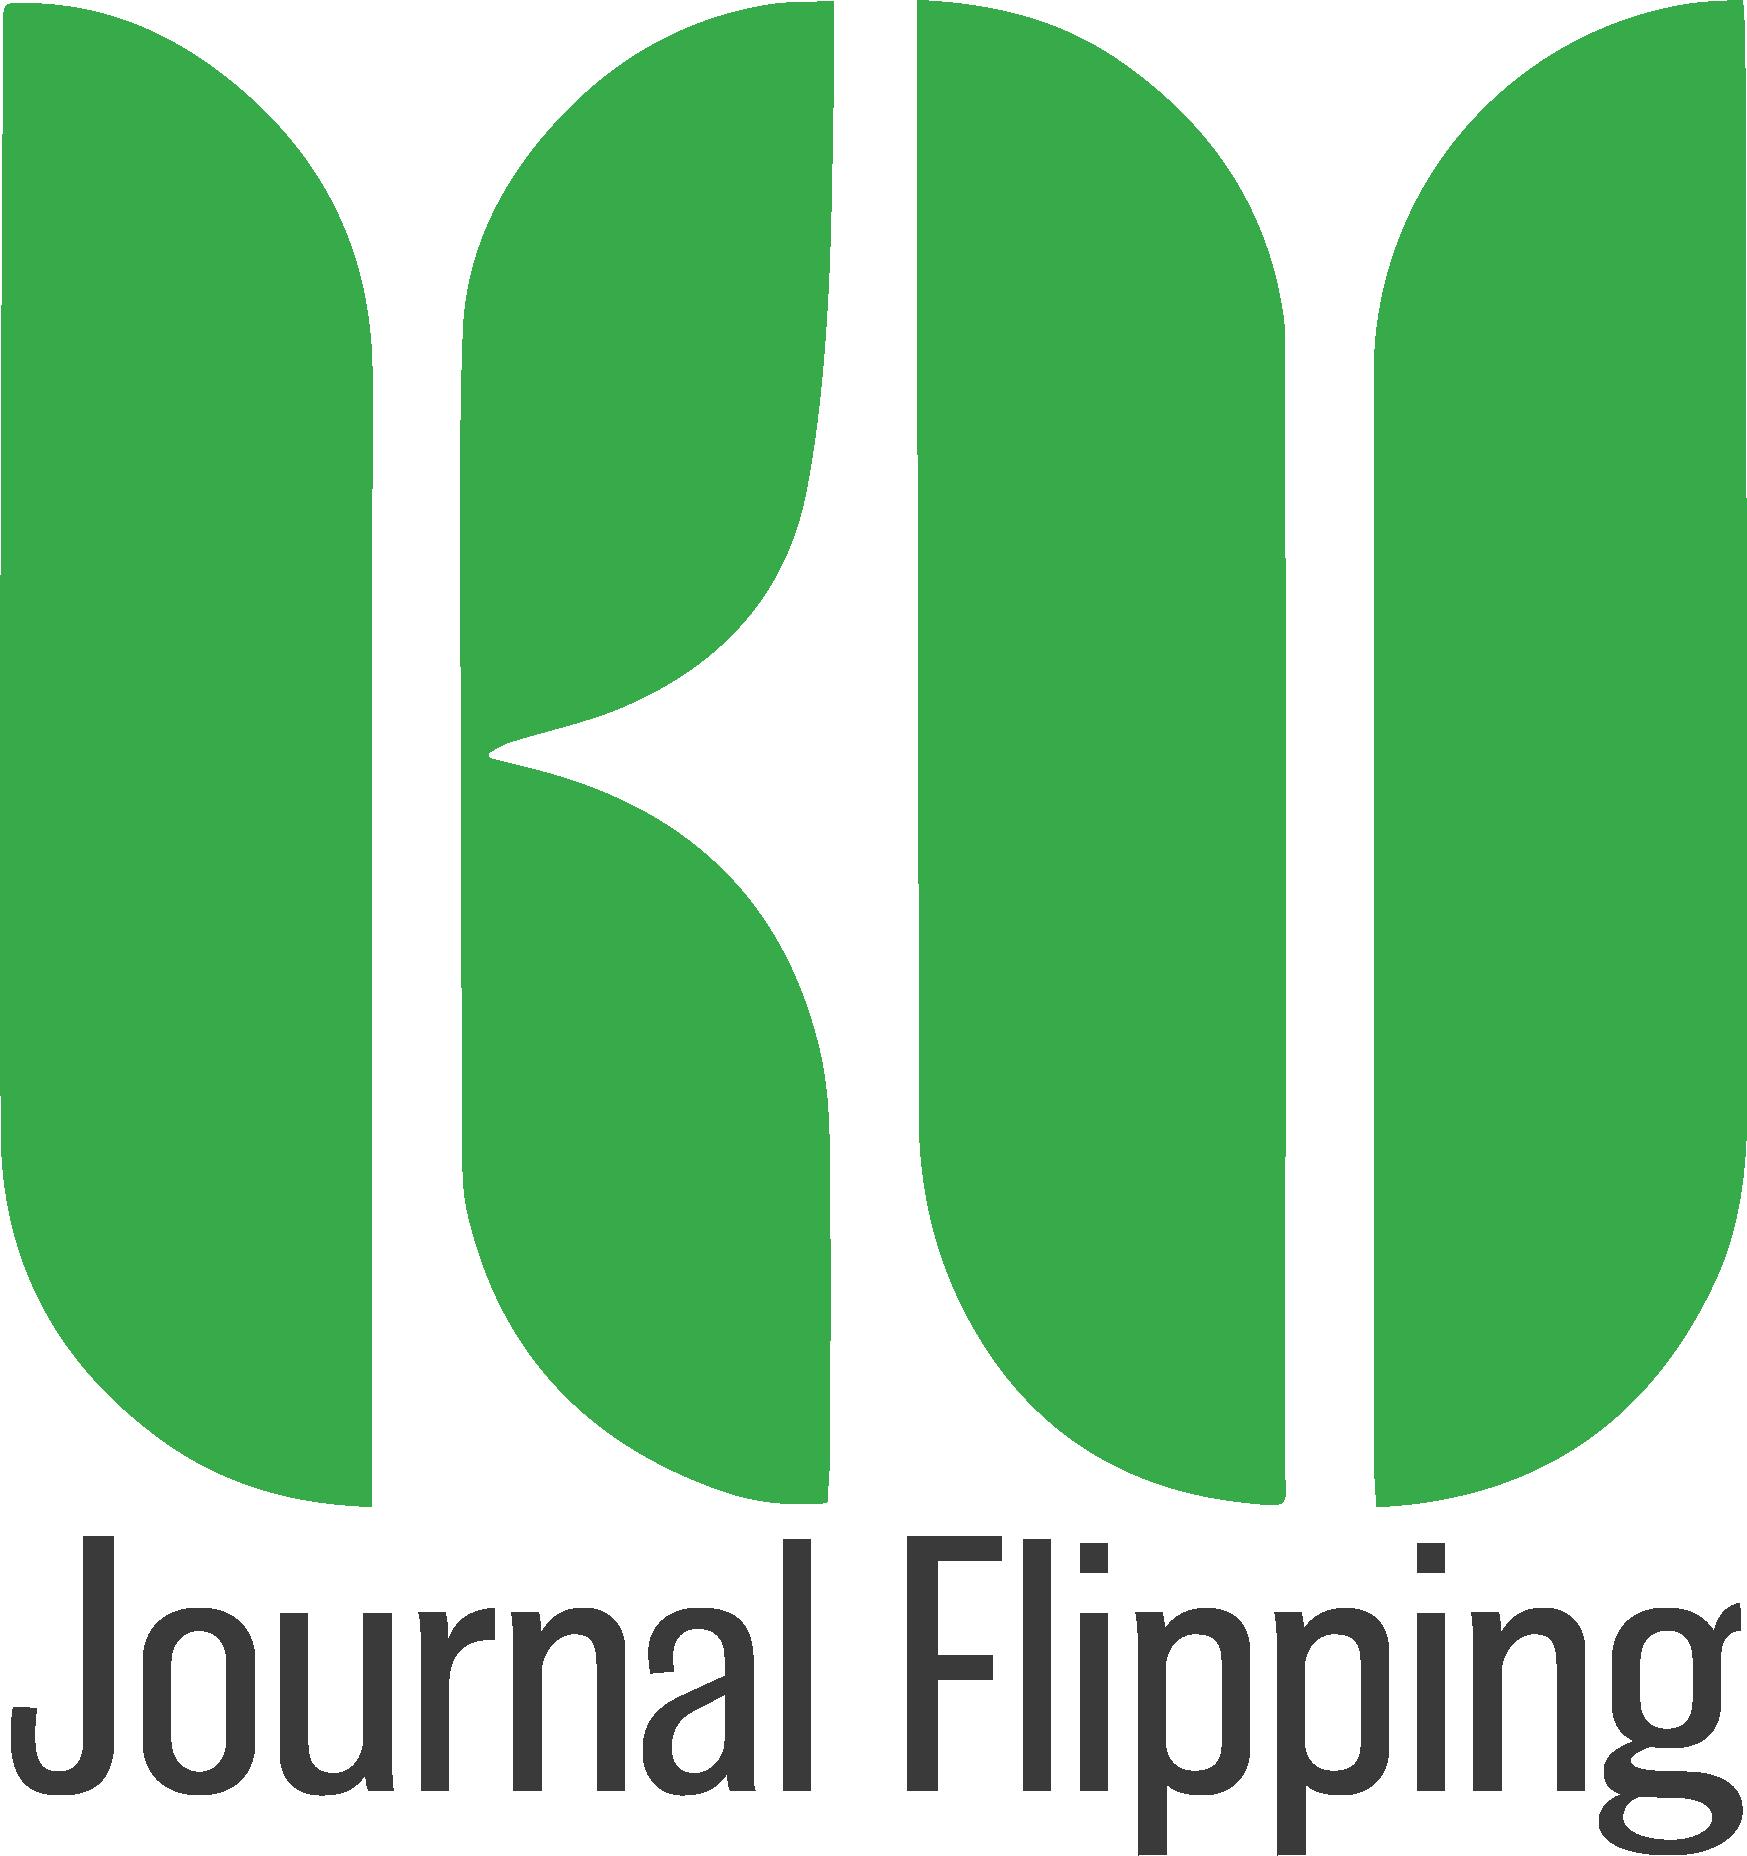 KU Journal Flipping logo